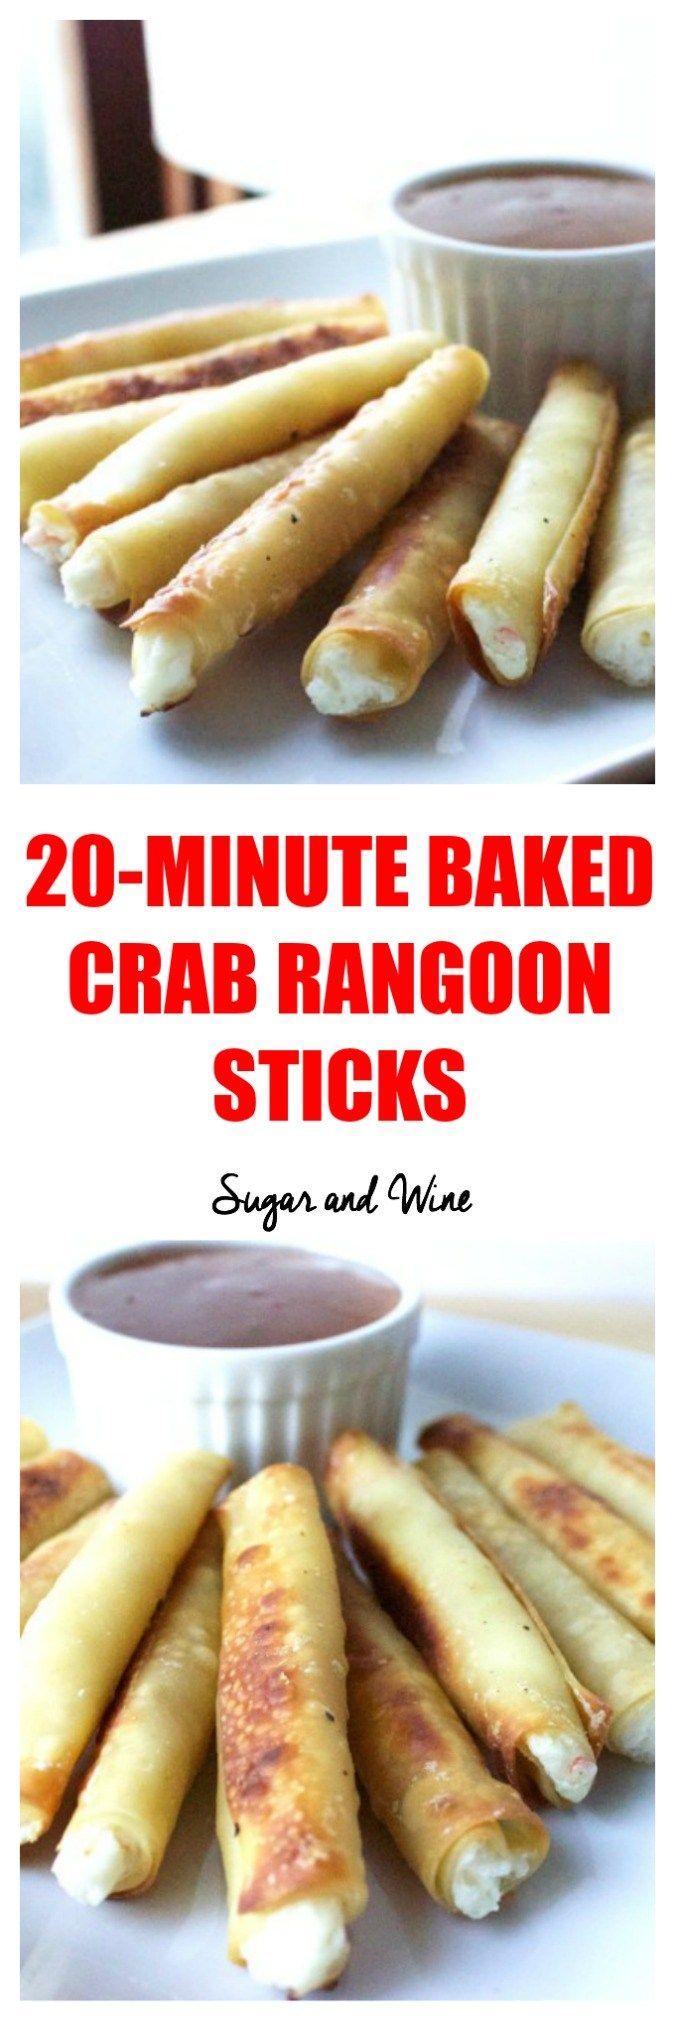 20 Minute Baked Crab Rangoon Sticks | Sugar and Wine